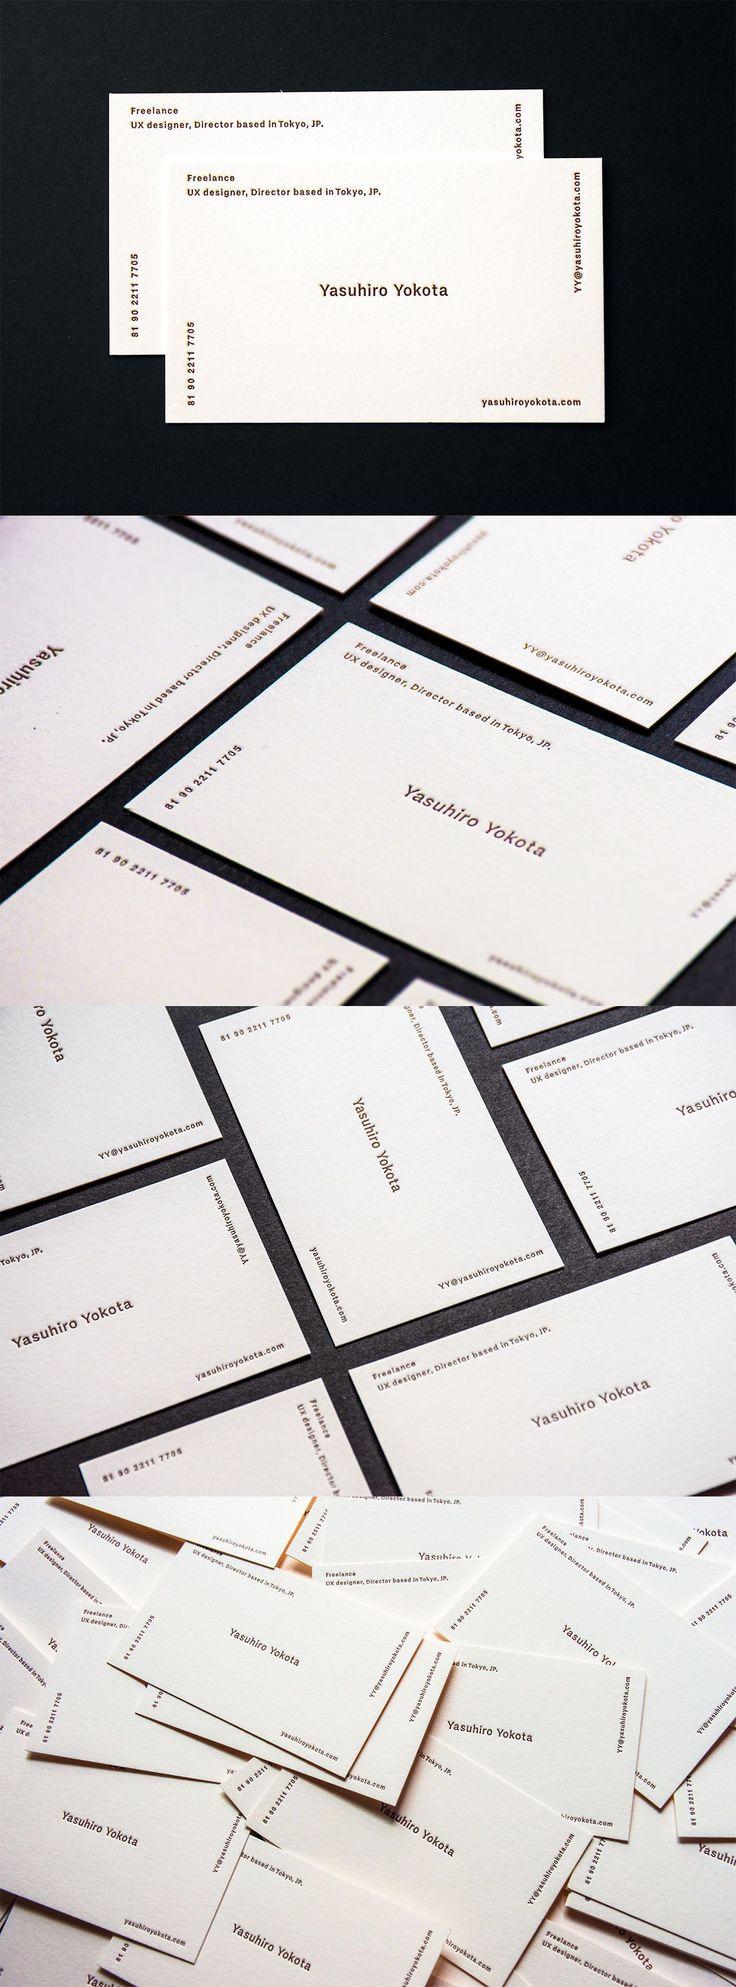 Personal Branding - Yasuhiro Yokota #businesscardmaker